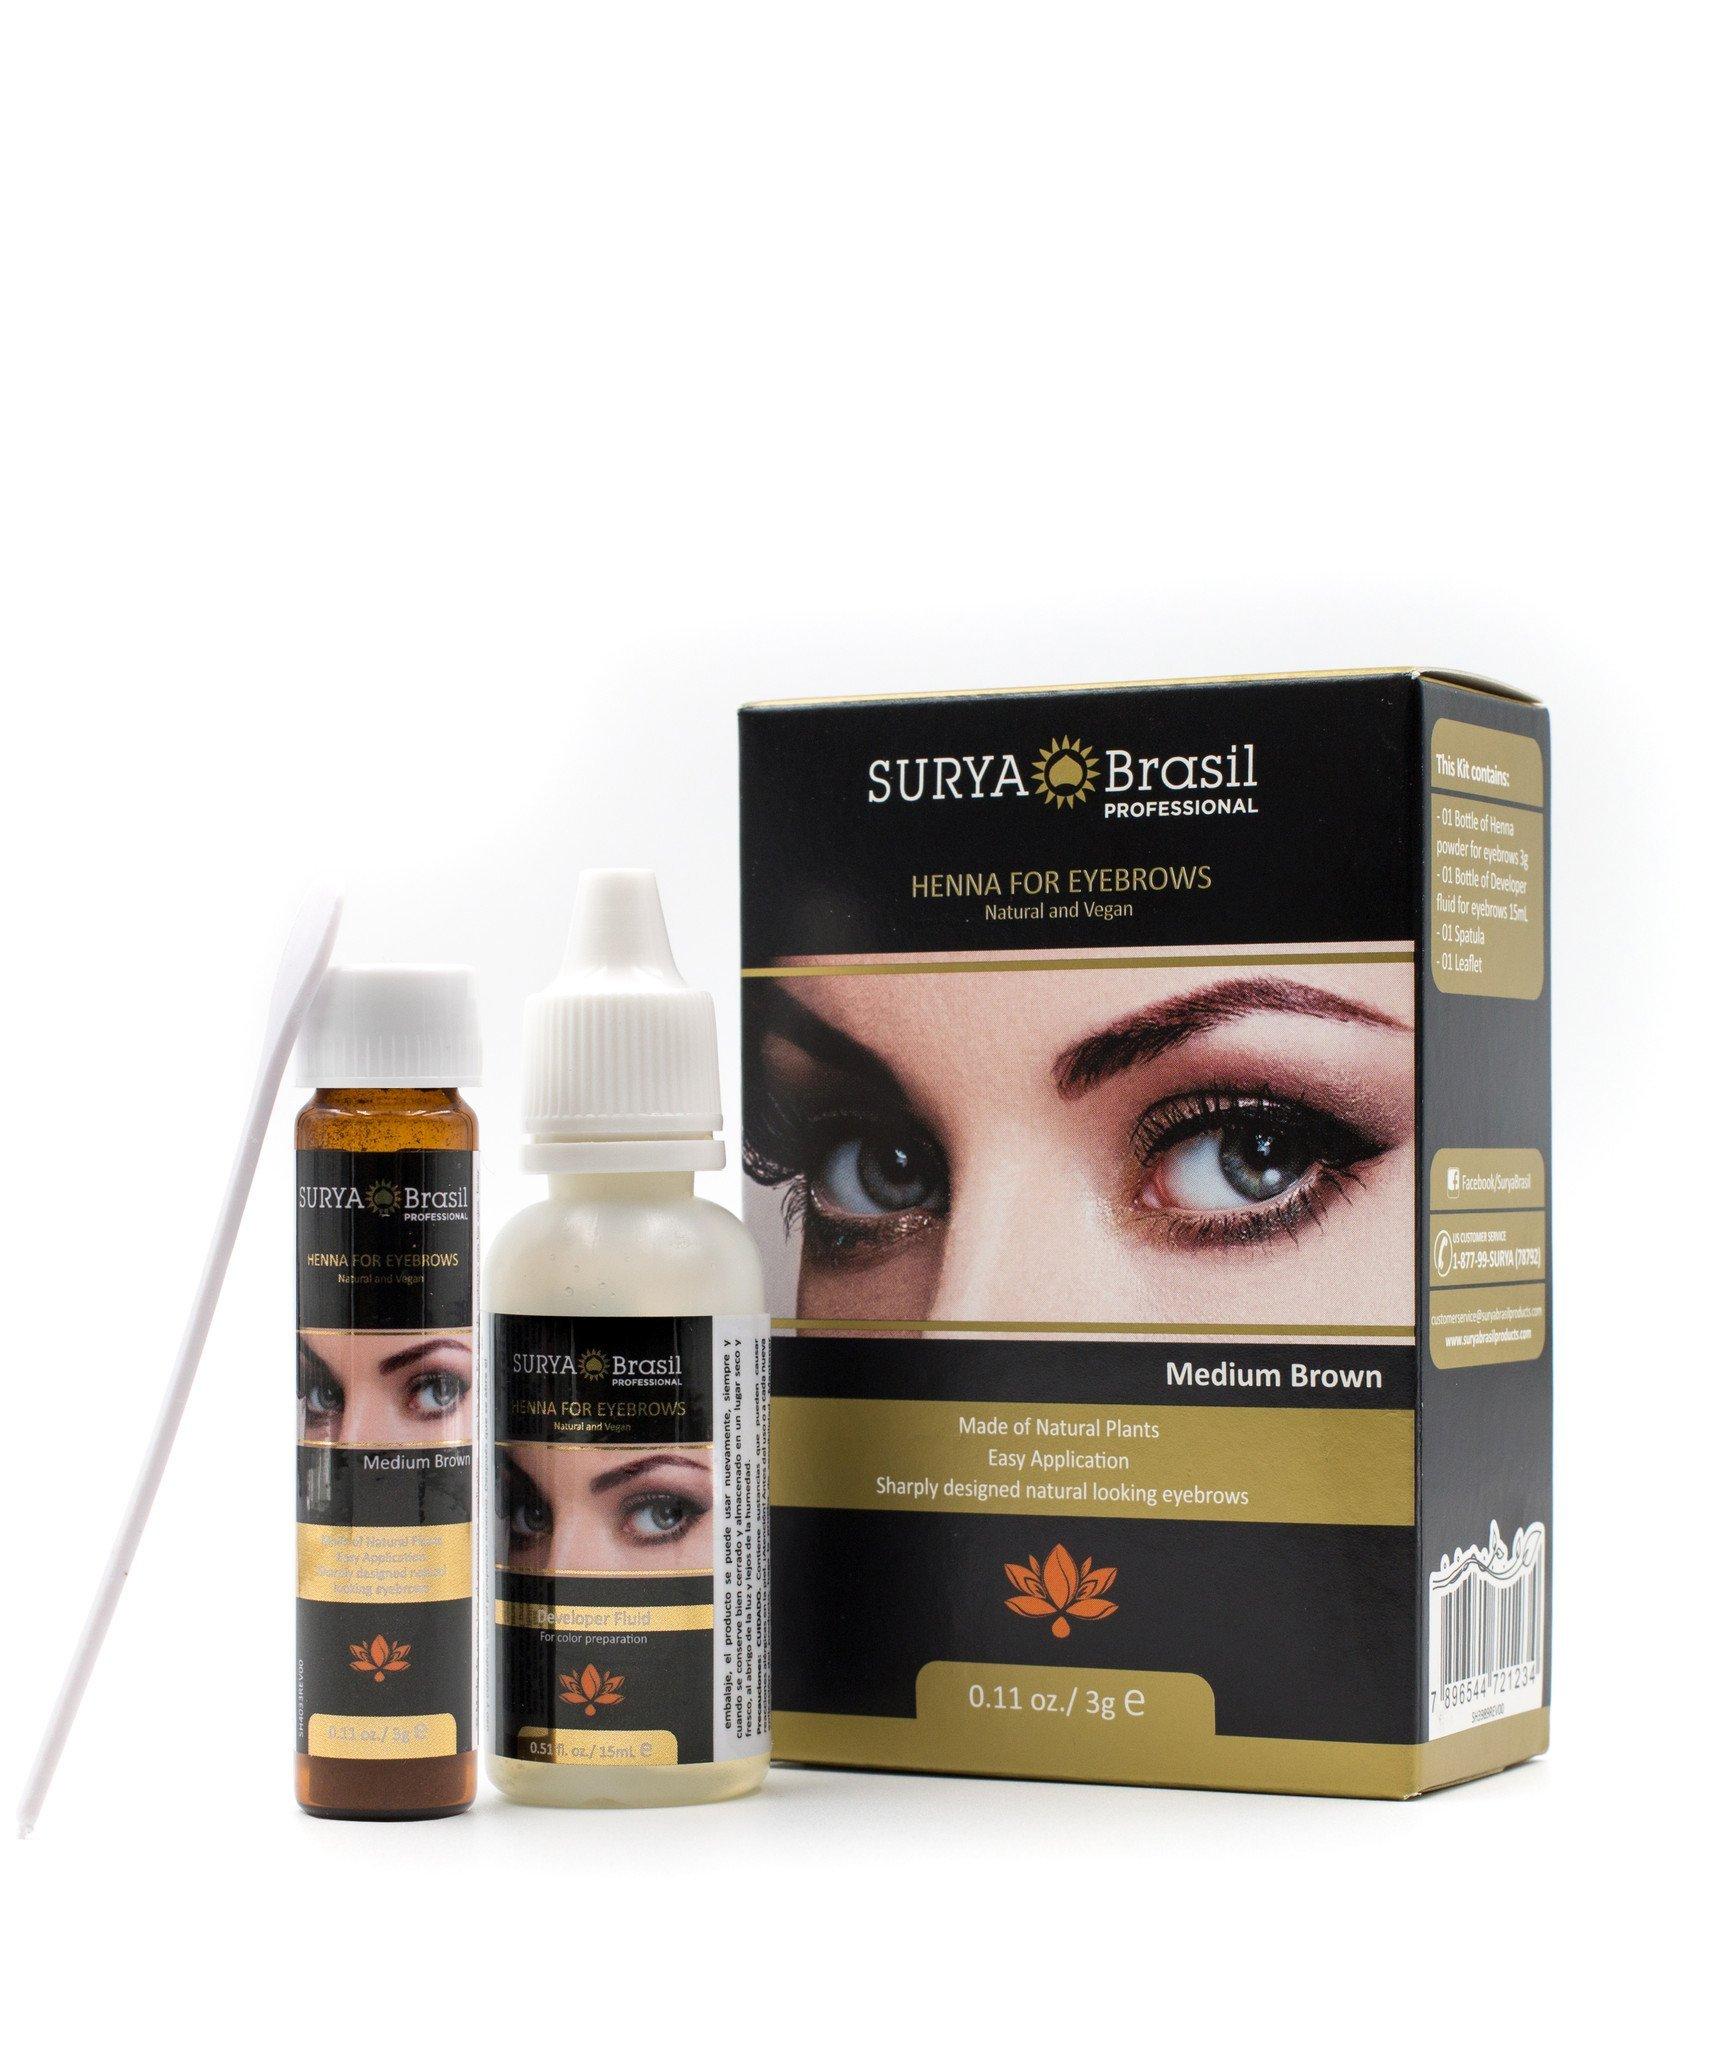 Amazon Surya Brasil Henna For Eyebrows With Free Sleek